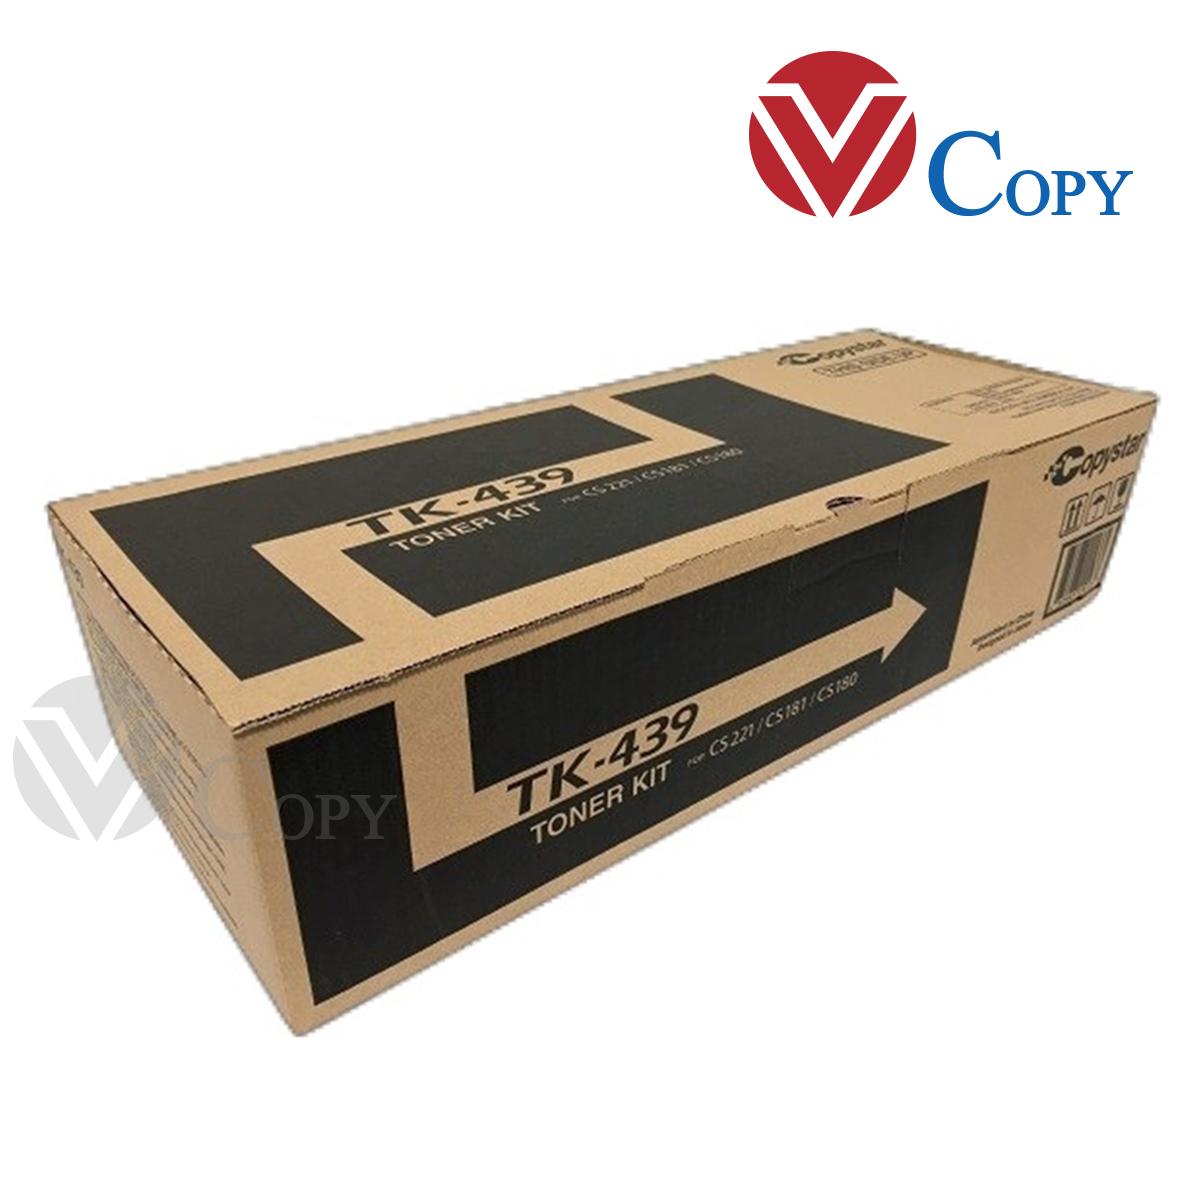 Mực Thương hiệu dùng cho máy Photocopy Kyocera TASKalfa 180/ 181/ 220/ 221- Hộp mực TK 439